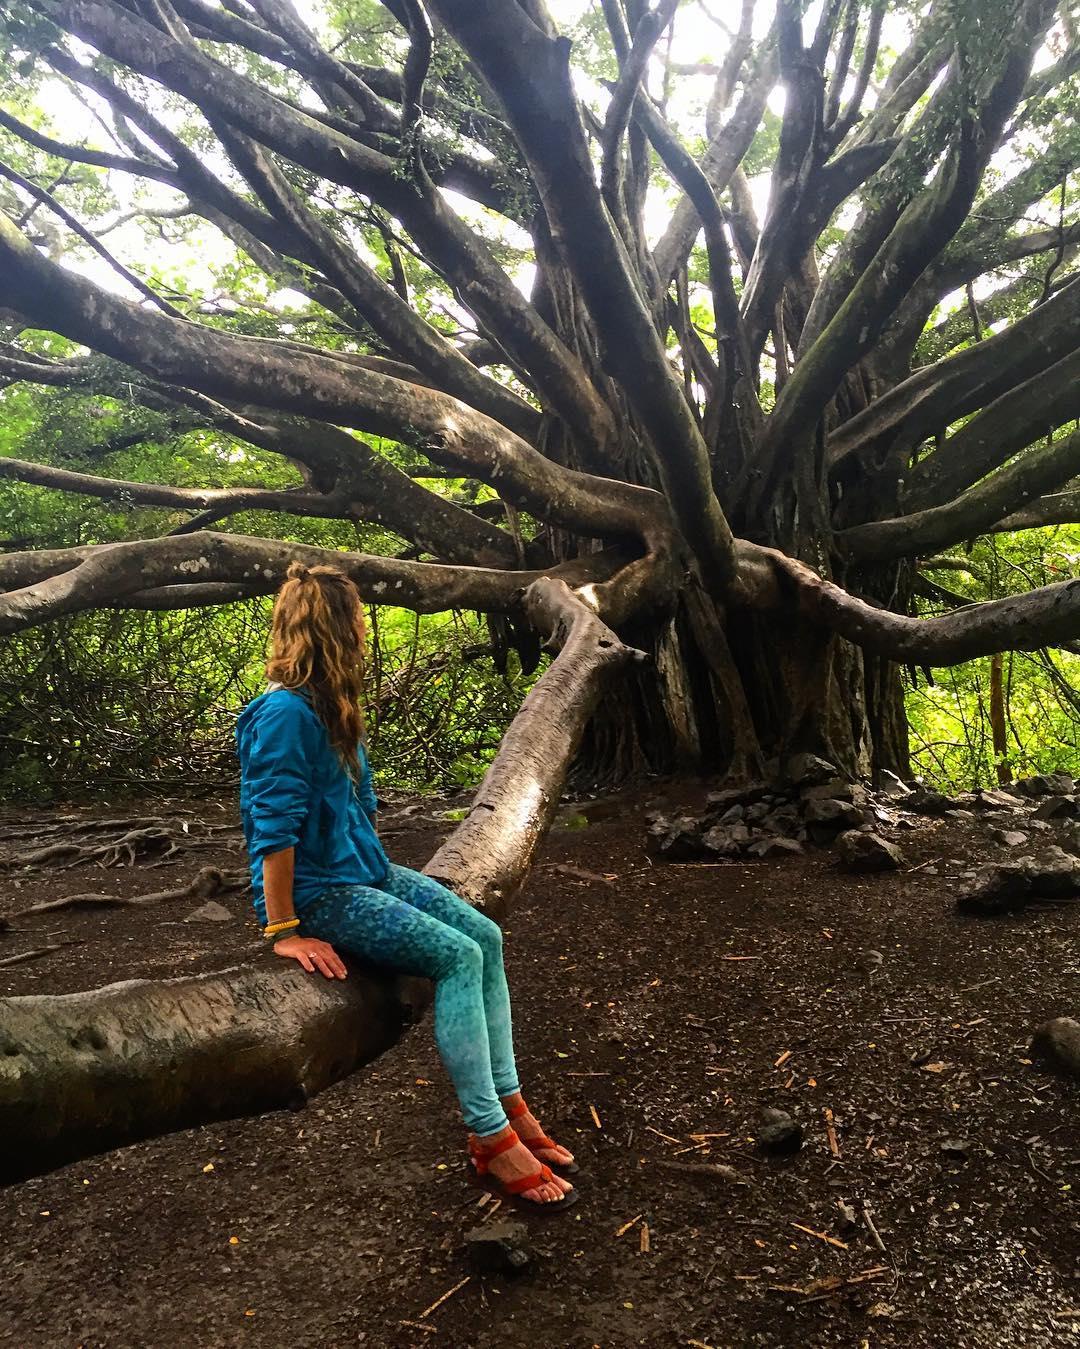 Quiet talk with an 80 year old Banyan Tree #wise #roadtohana #maui #hawaii #aloha #hiking